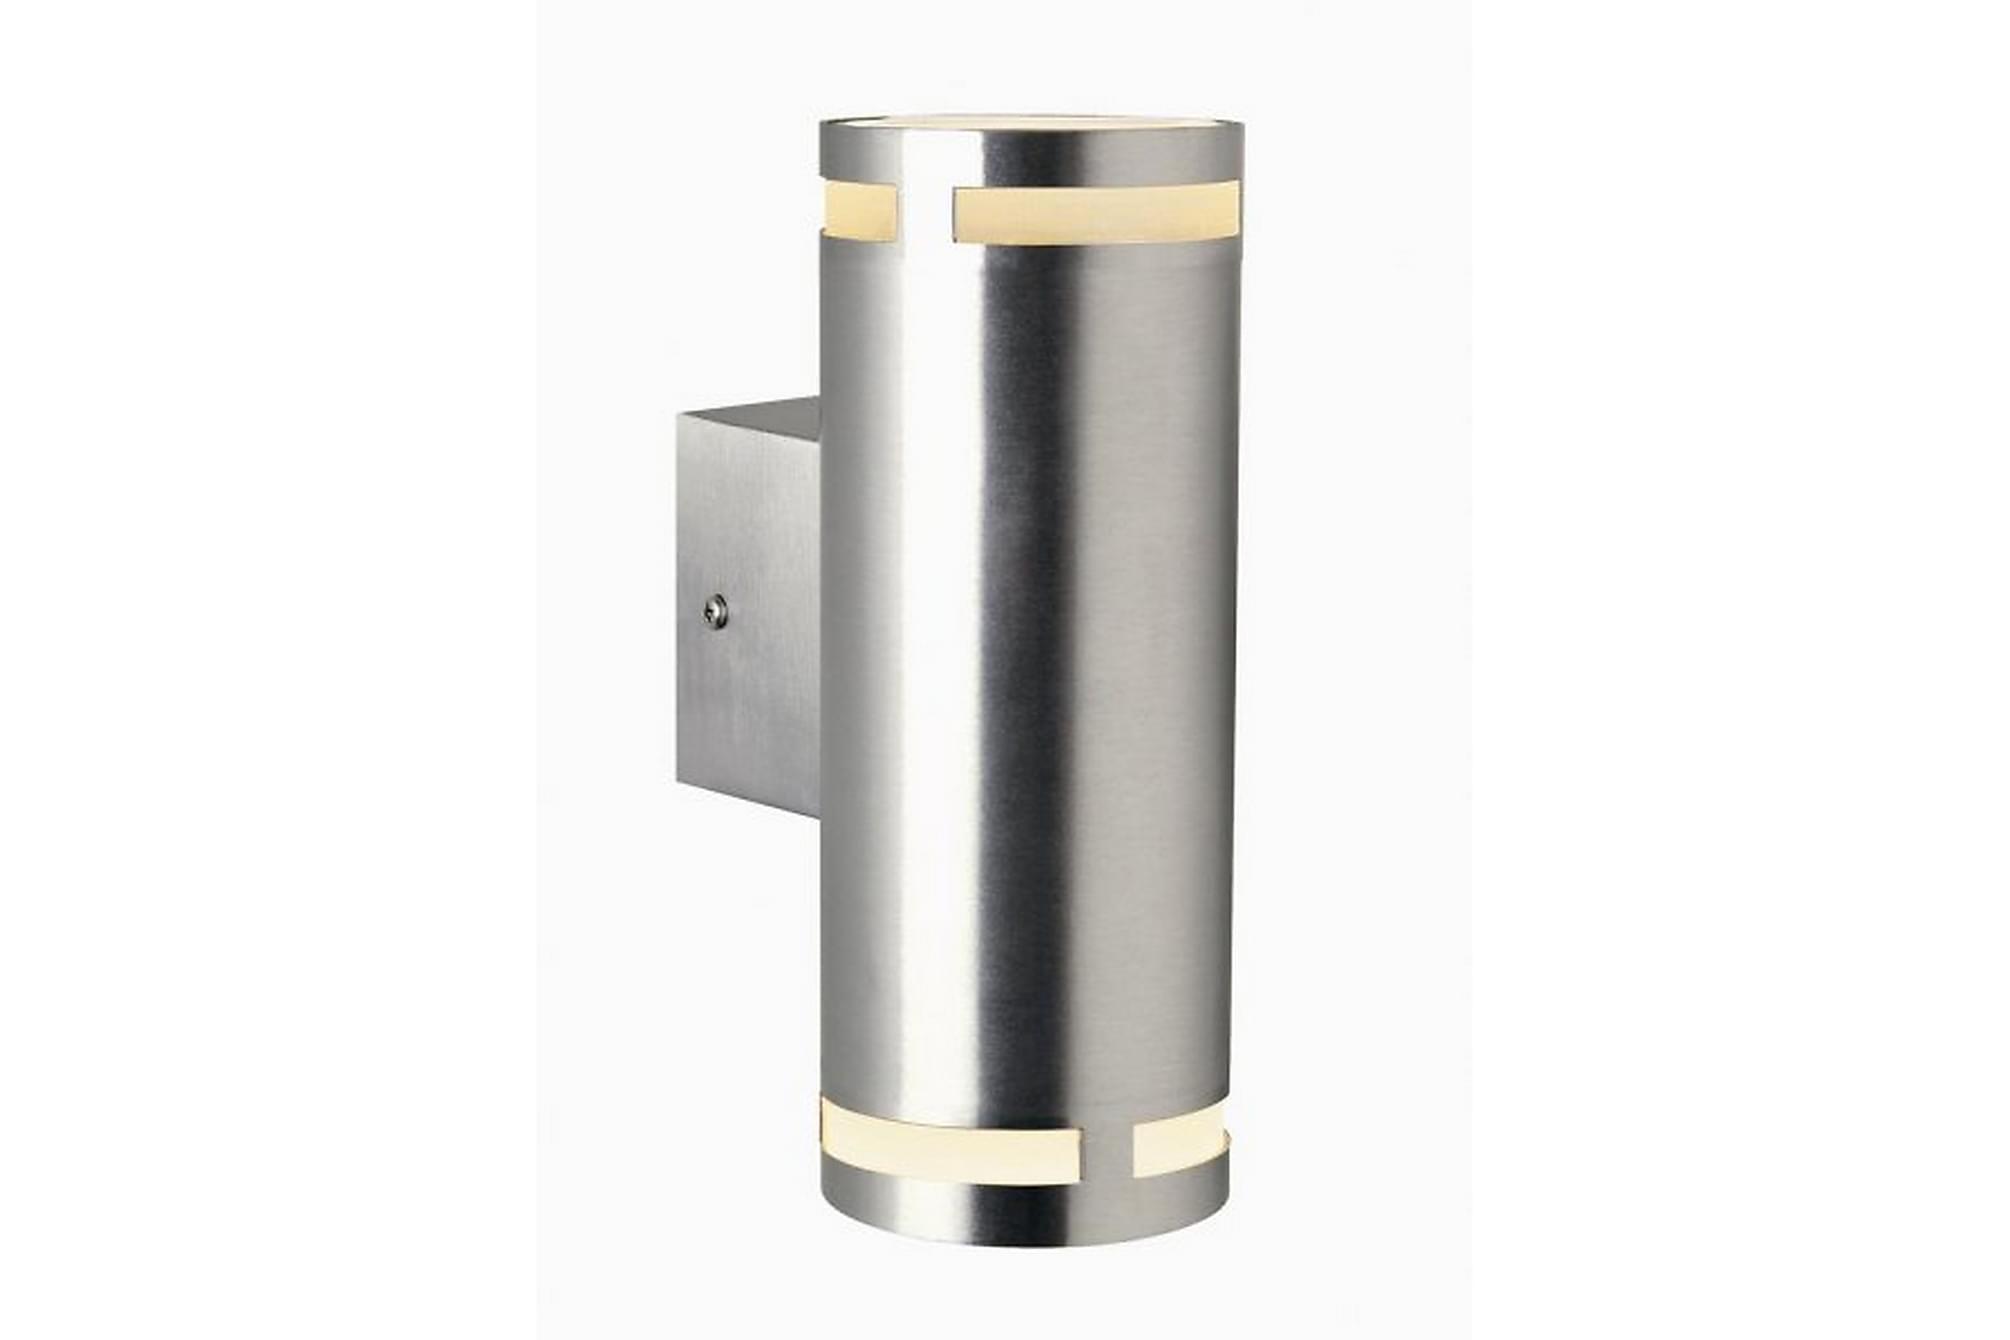 CAN Fasadbelysning 8 Rund Maxi Upp/Nedljus Aluminium, Utomhusbelysning